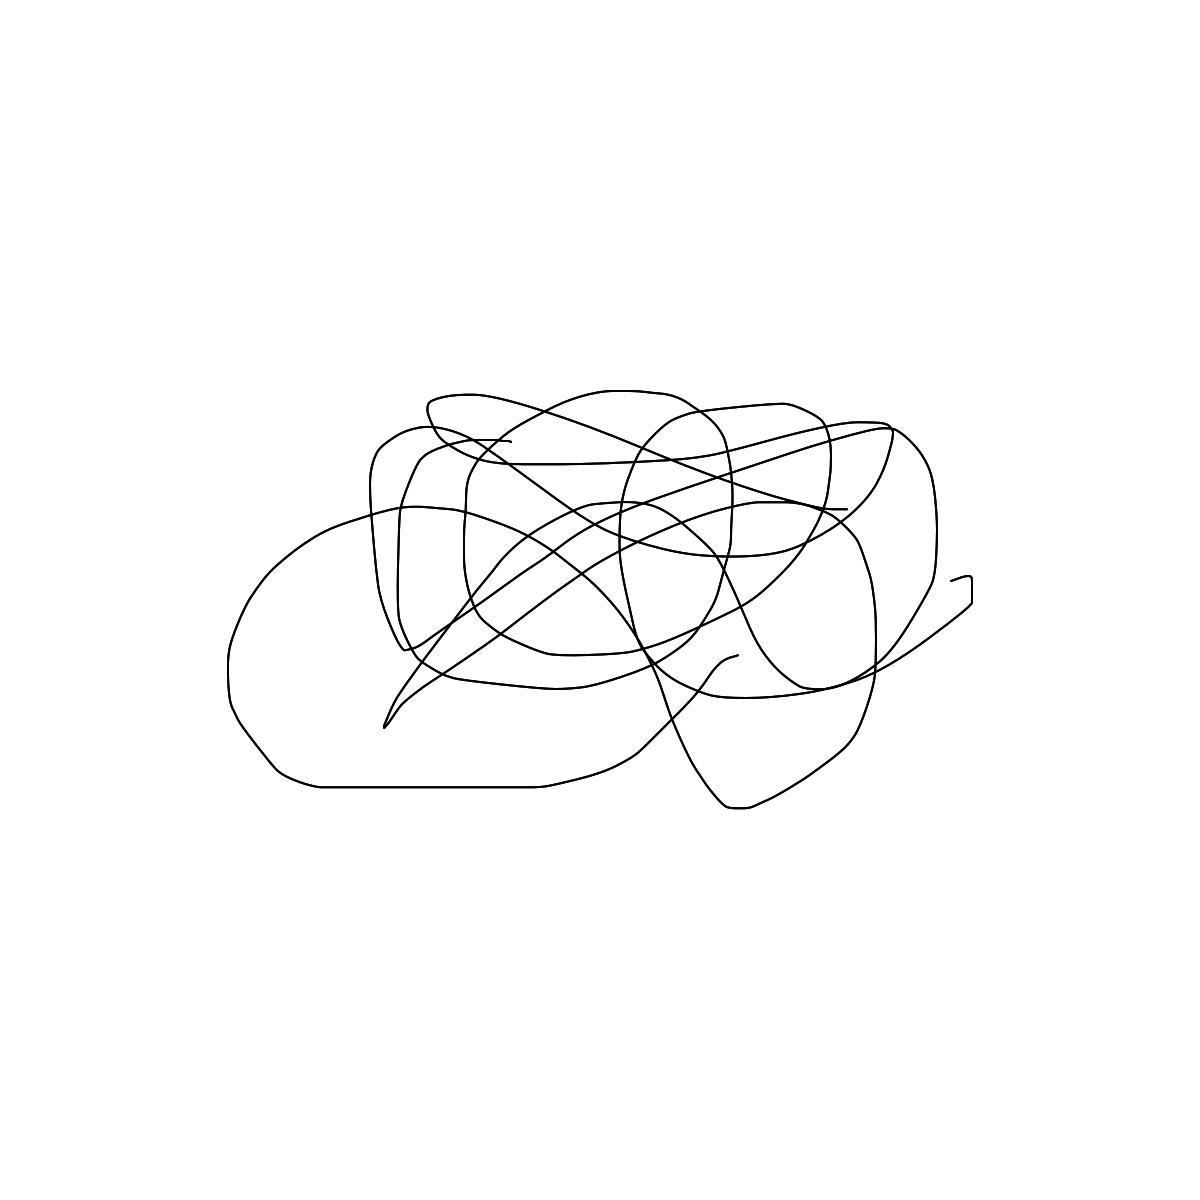 BAAAM drawing#1513 lat:40.6005020141601560lng: -8.6066827774047850